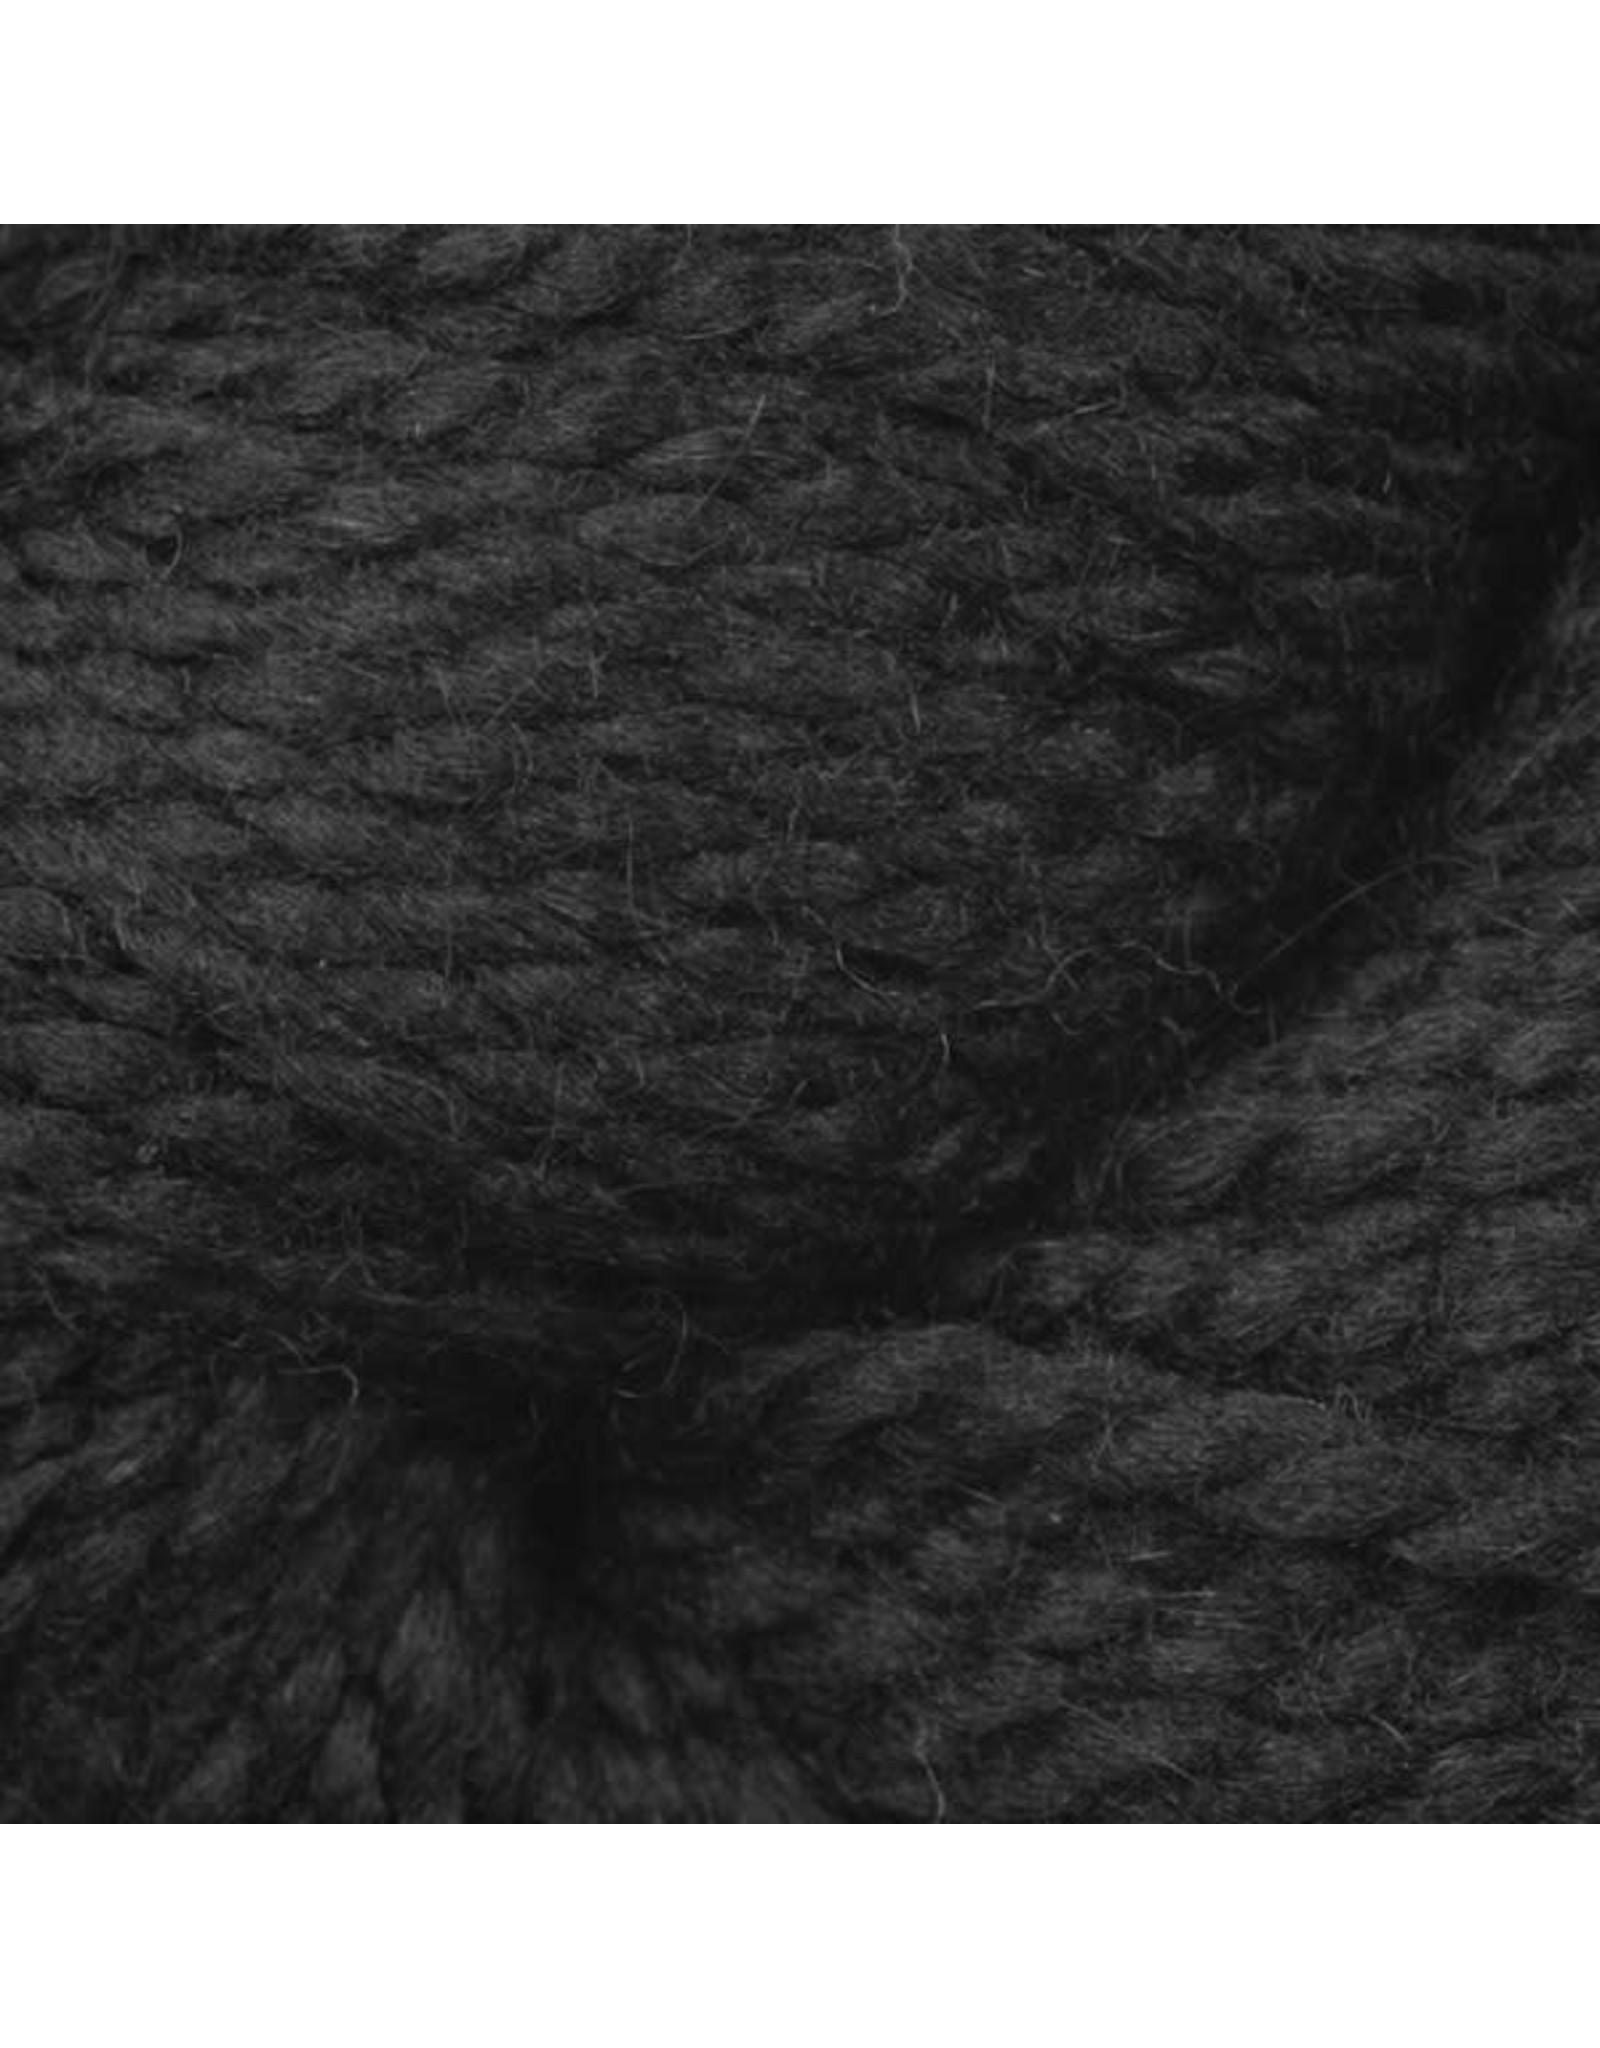 7245 Pitch Black - Ultra Alpaca Chunky - Berroco